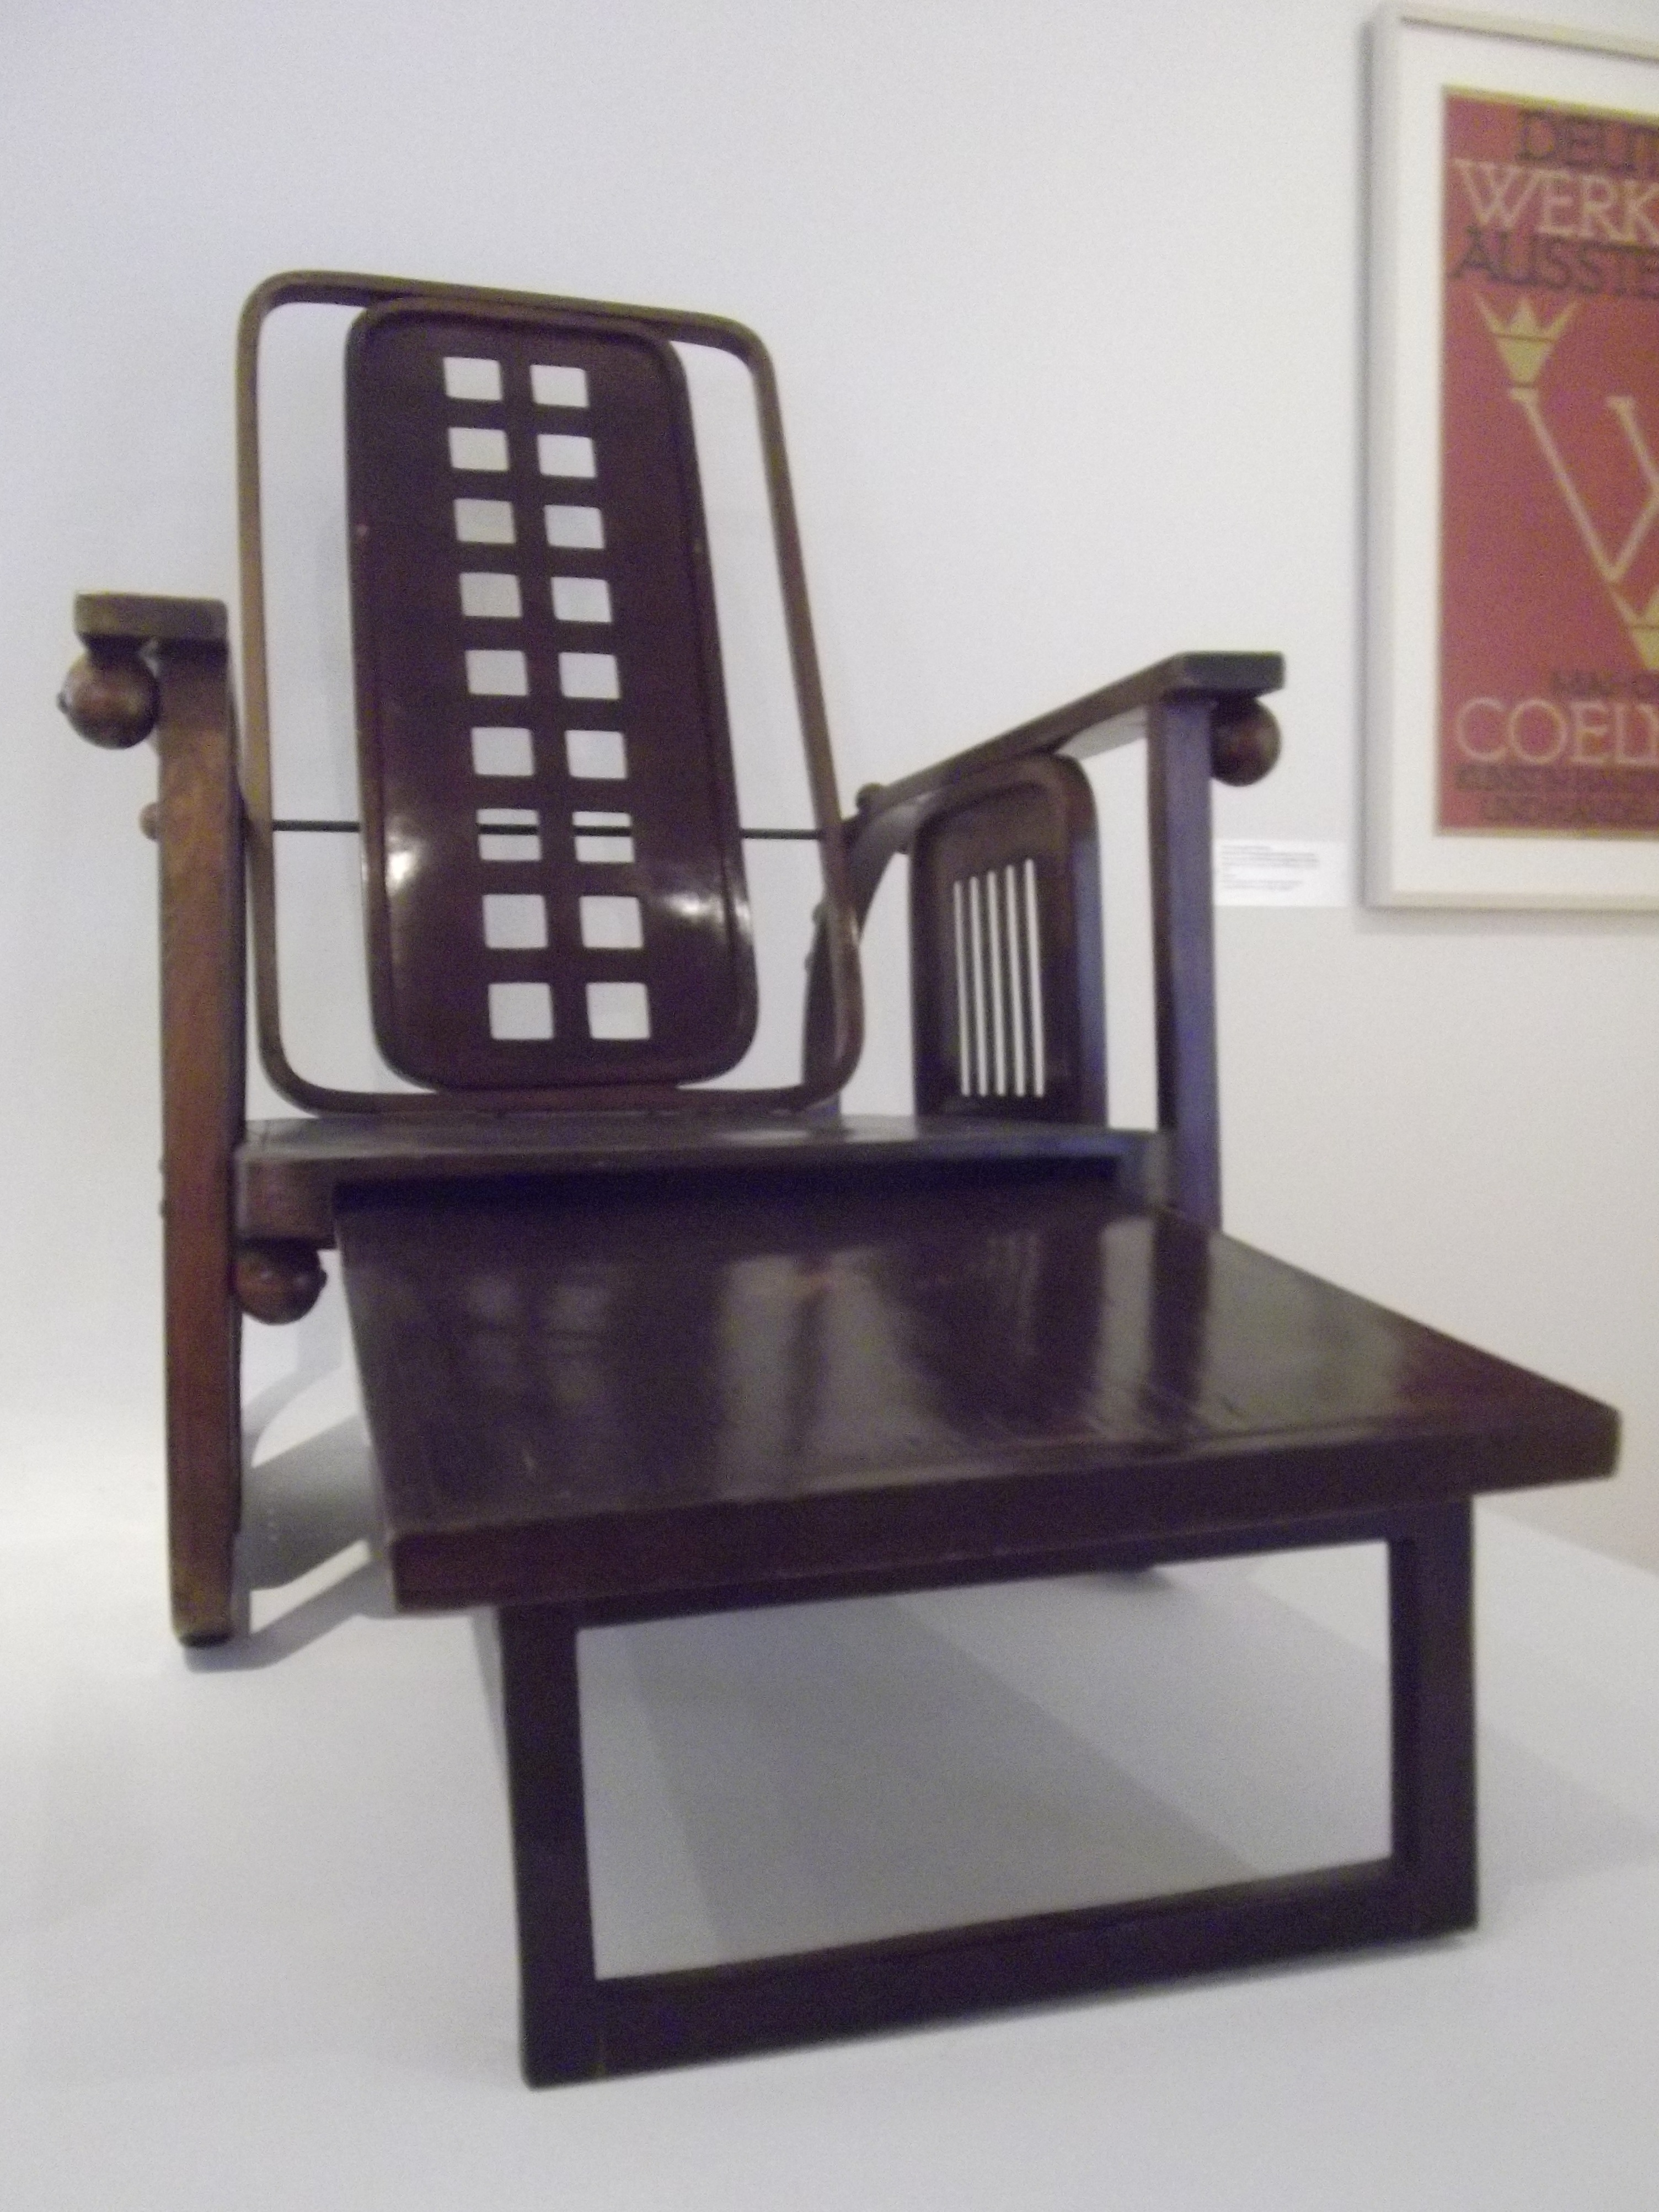 file makk josef hoffmann m wikimedia commons. Black Bedroom Furniture Sets. Home Design Ideas